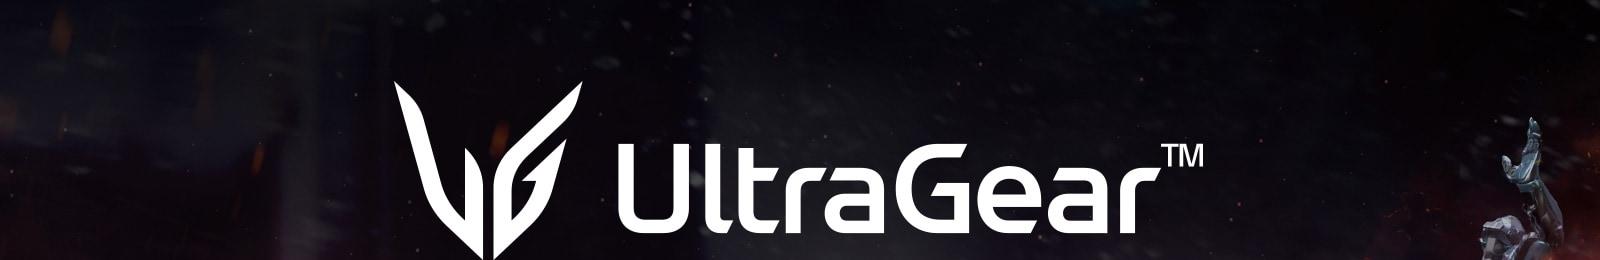 UltraGear™ monitor za igranje videoigara